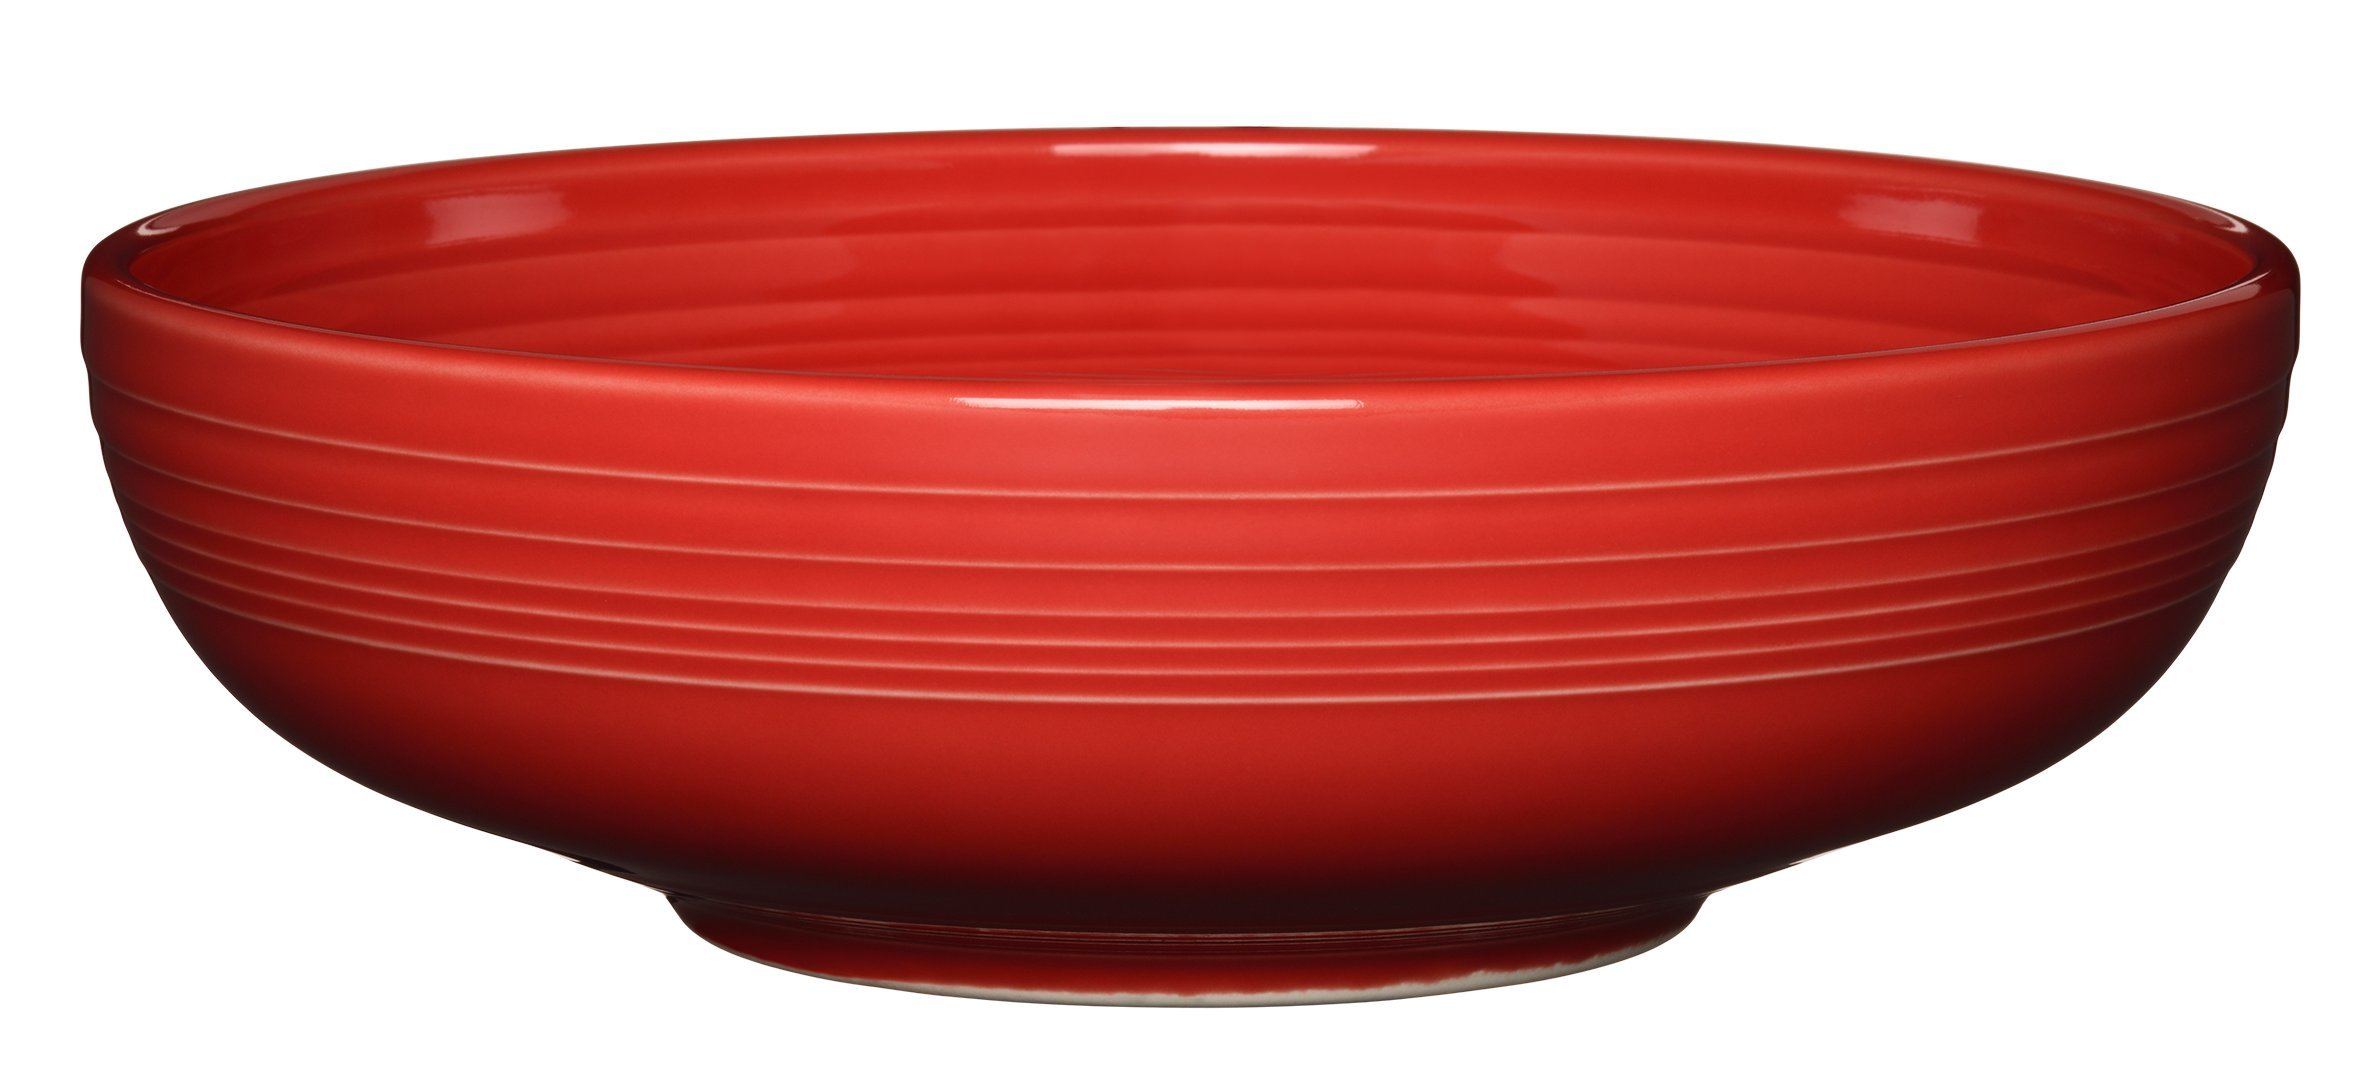 Fiesta Bistro Serving Bowl, 96 oz, Scarlet